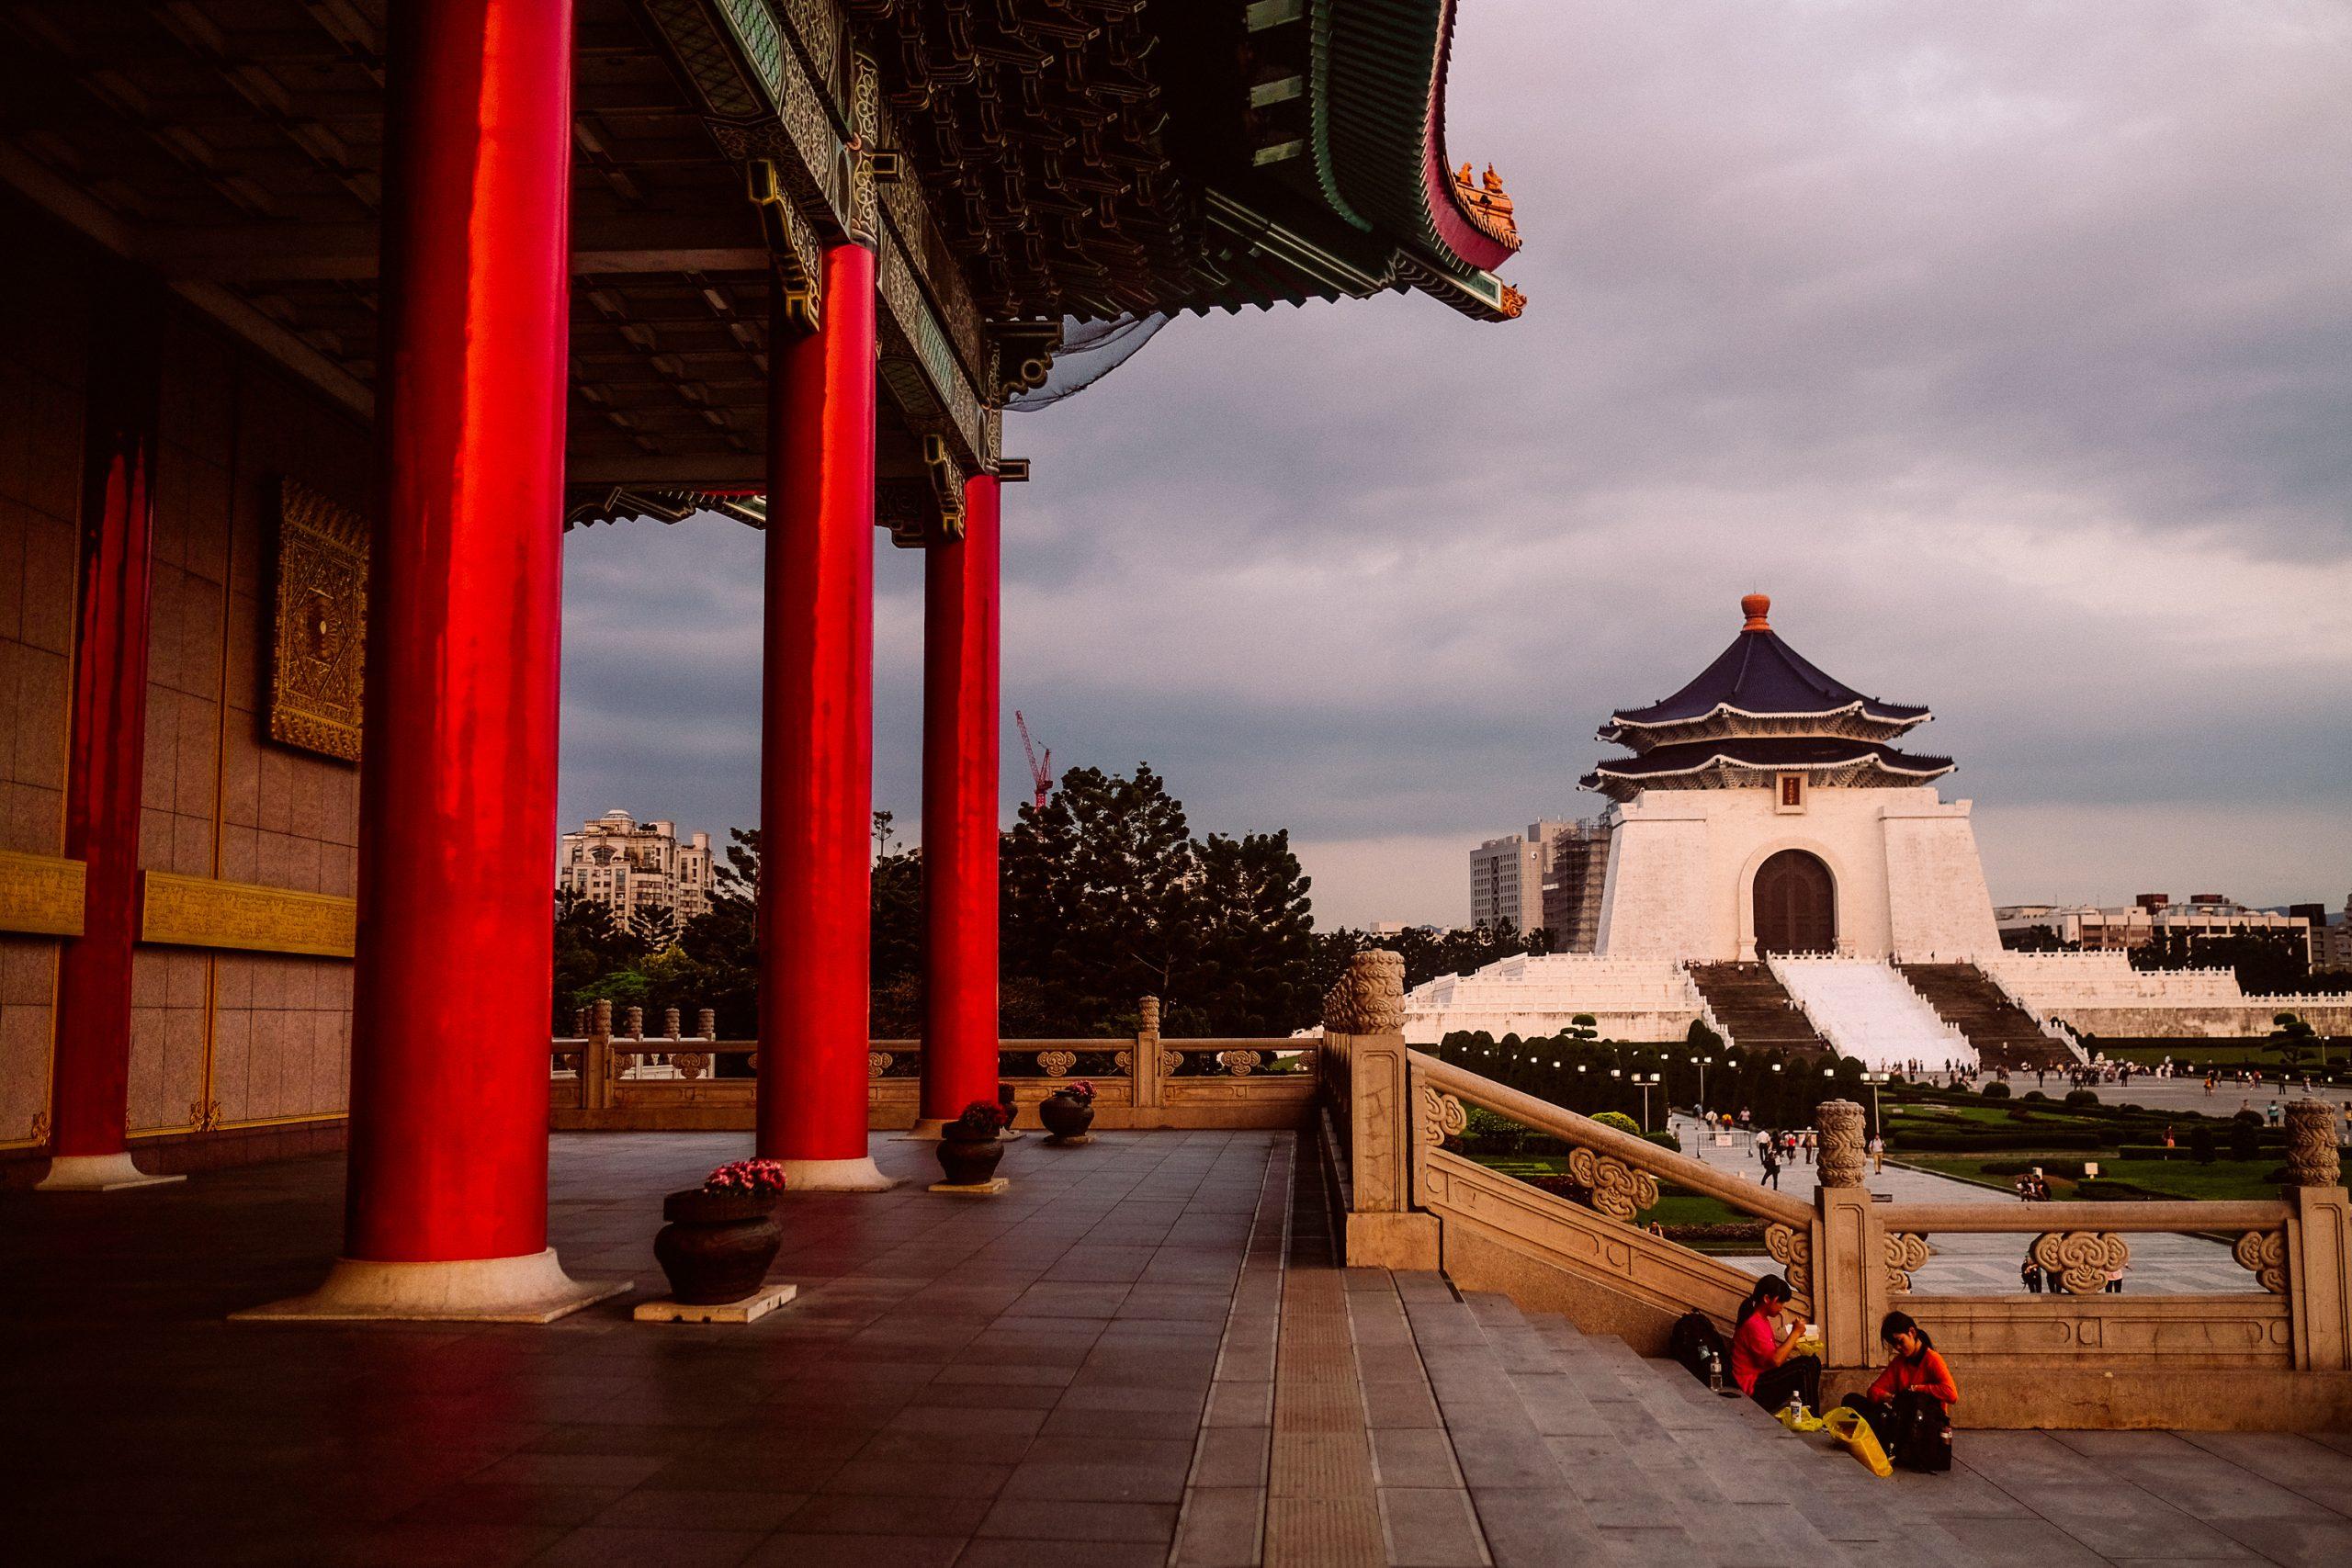 Risultati di ricerca Risultati web Chiang Kai-shek Memorial Hall in Taipei